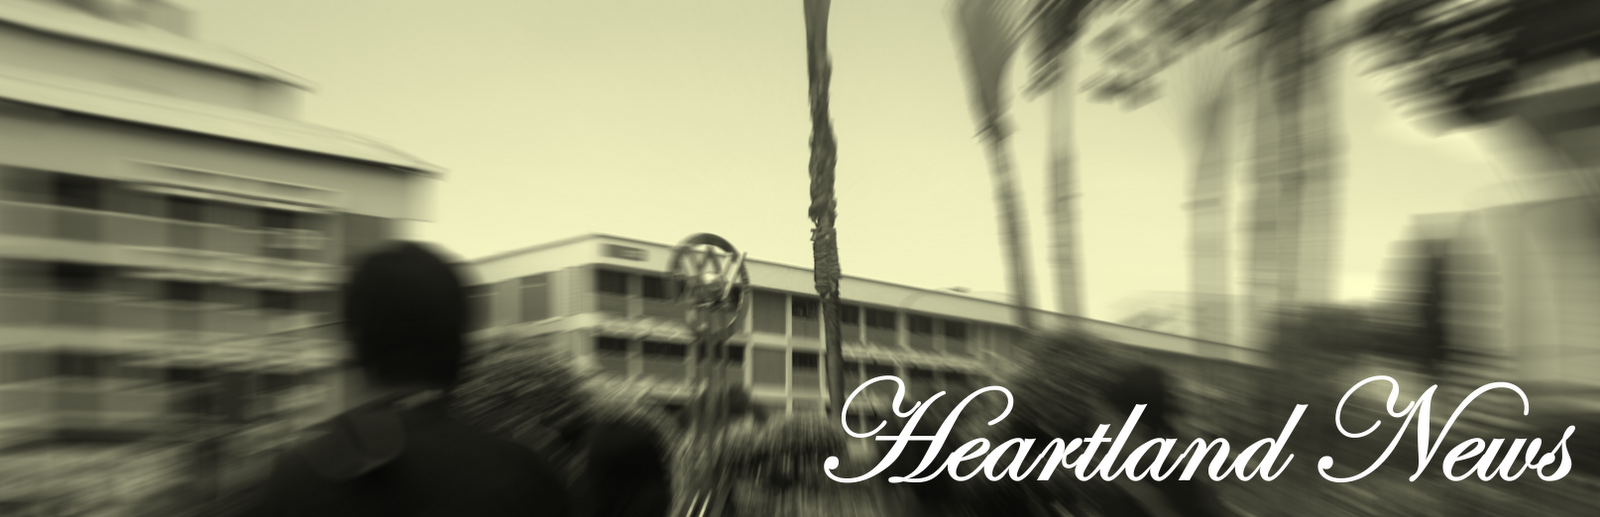 Heartland News